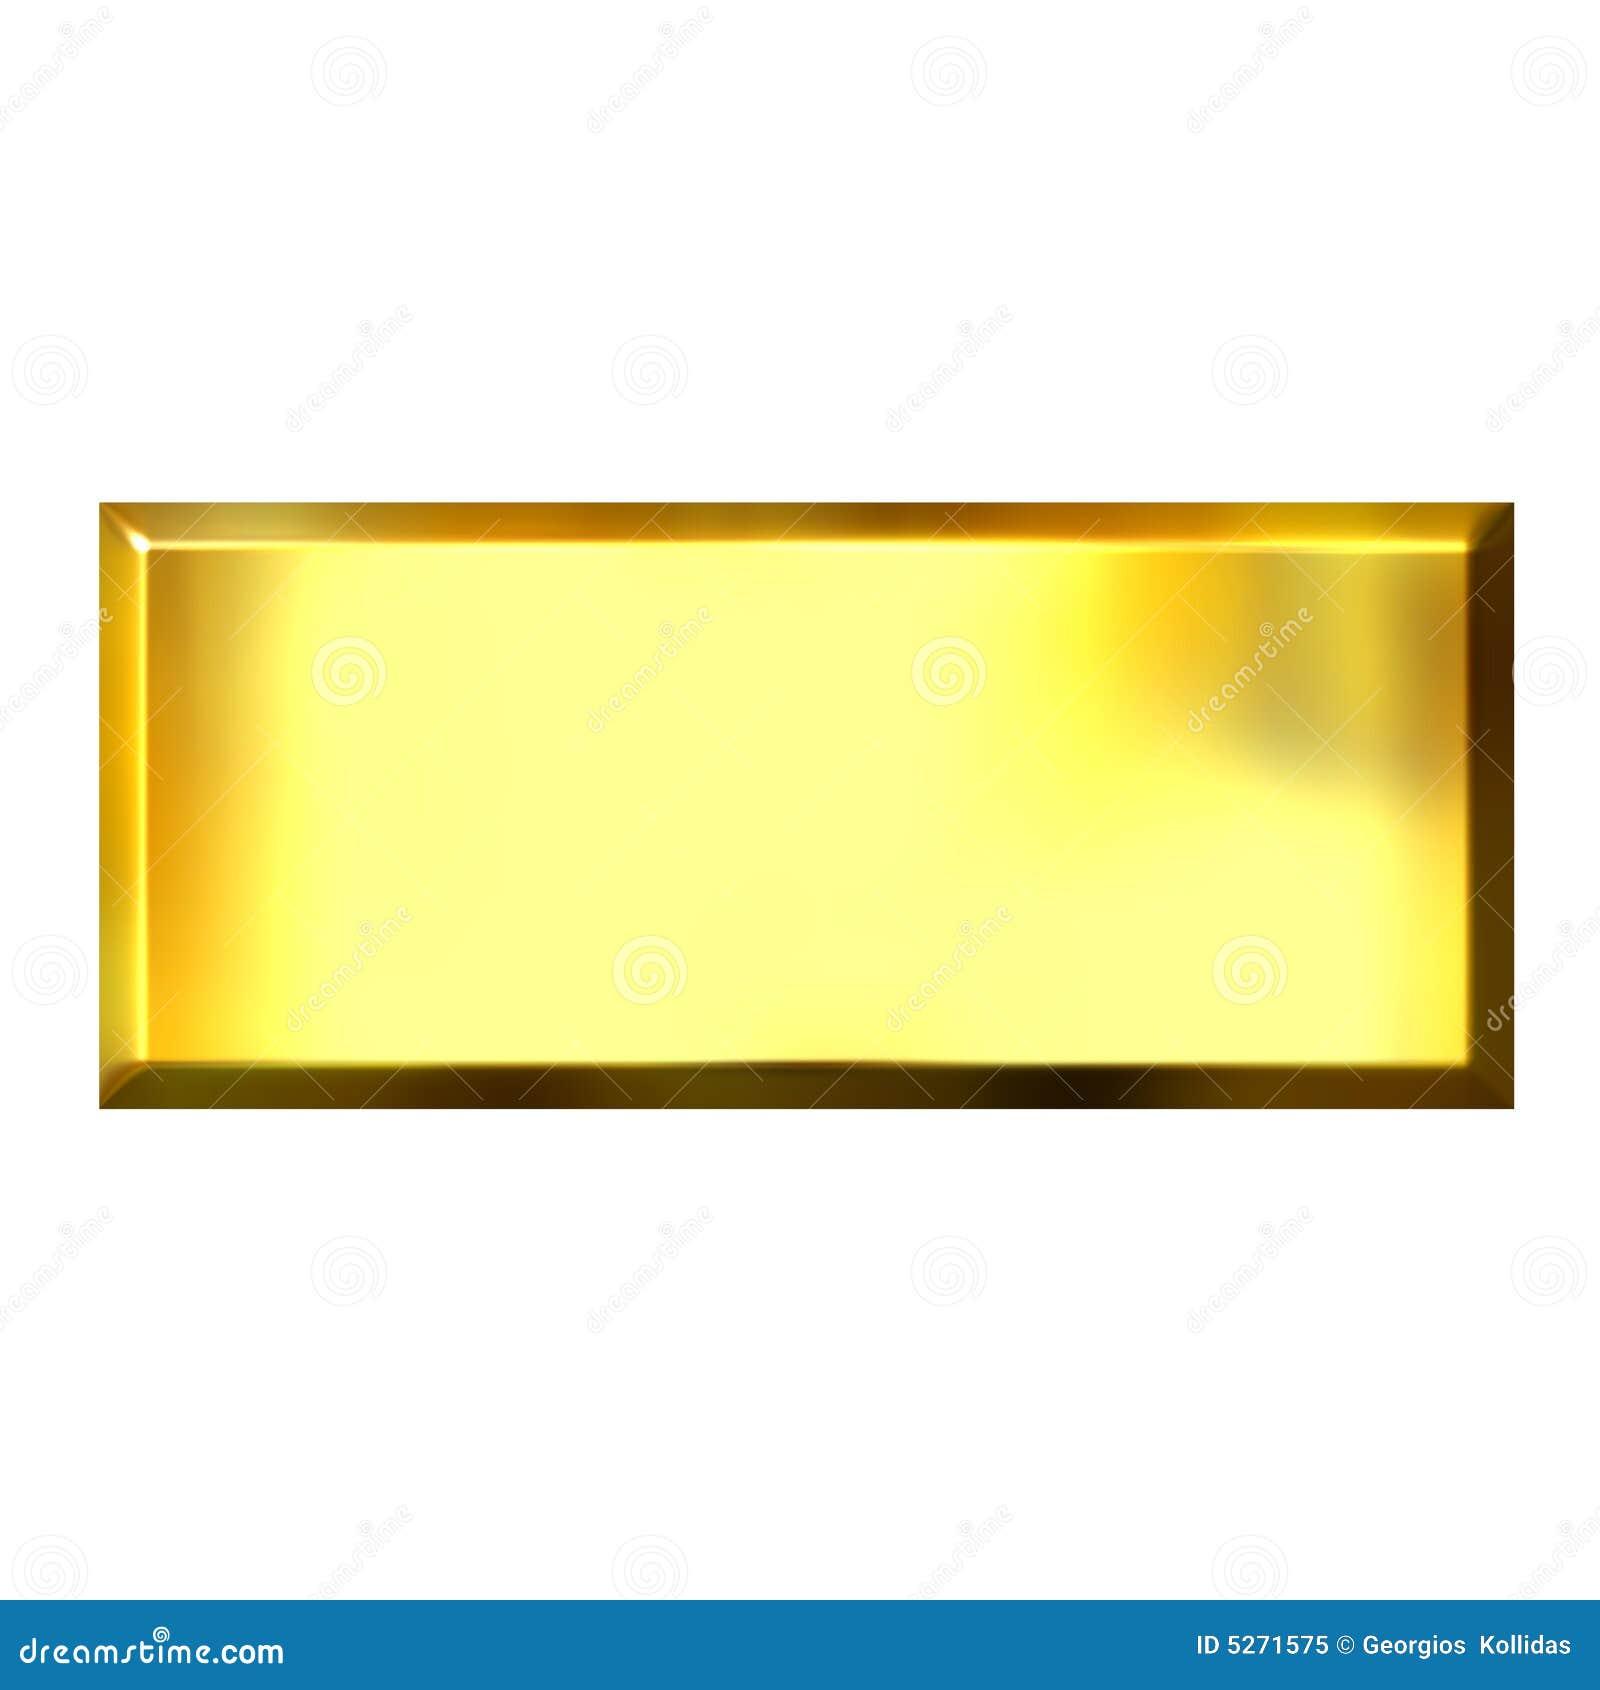 http://thumbs.dreamstime.com/z/3d-golden-square-button-5271575.jpg 3d